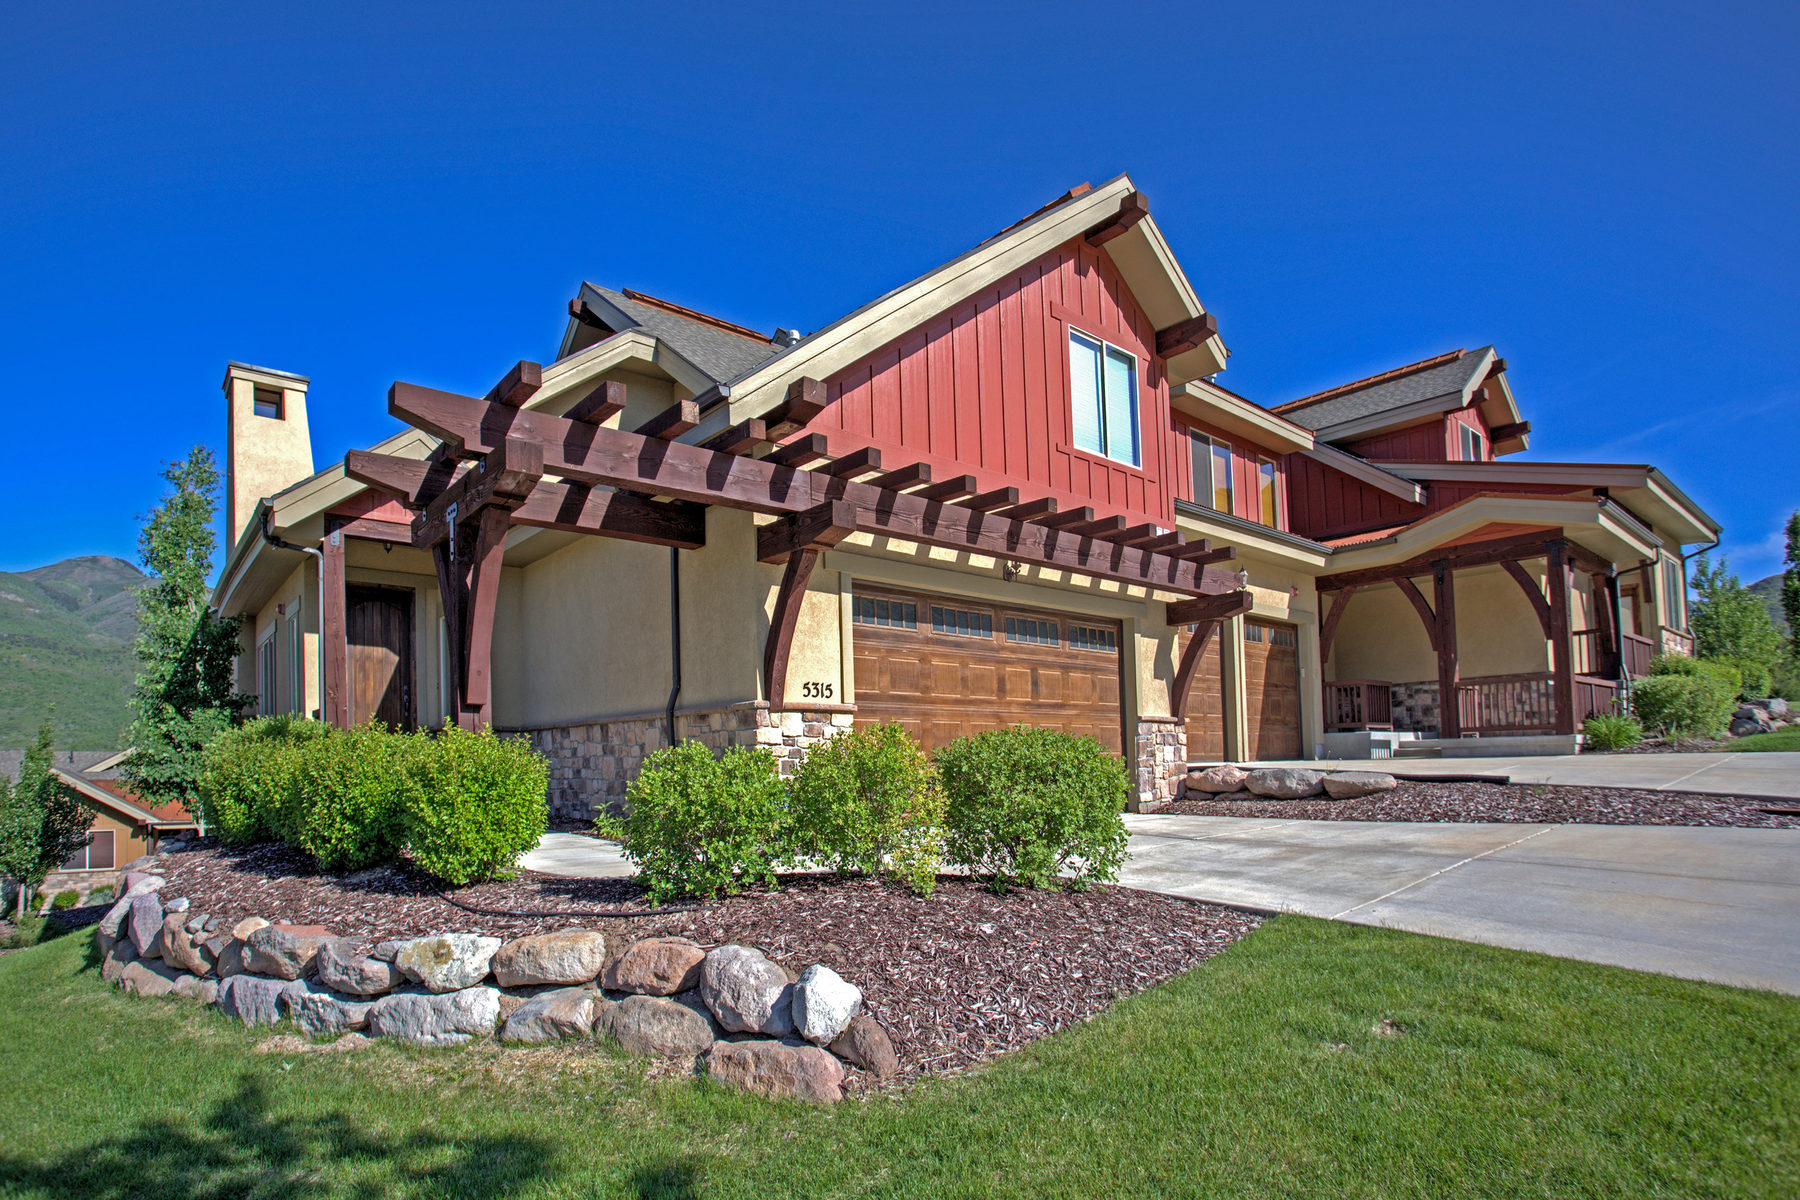 Moradia em banda para Venda às Open Floor Plan in Immaculate Condition 5315 Edgewood Ave Heber, Utah 84032 Estados Unidos